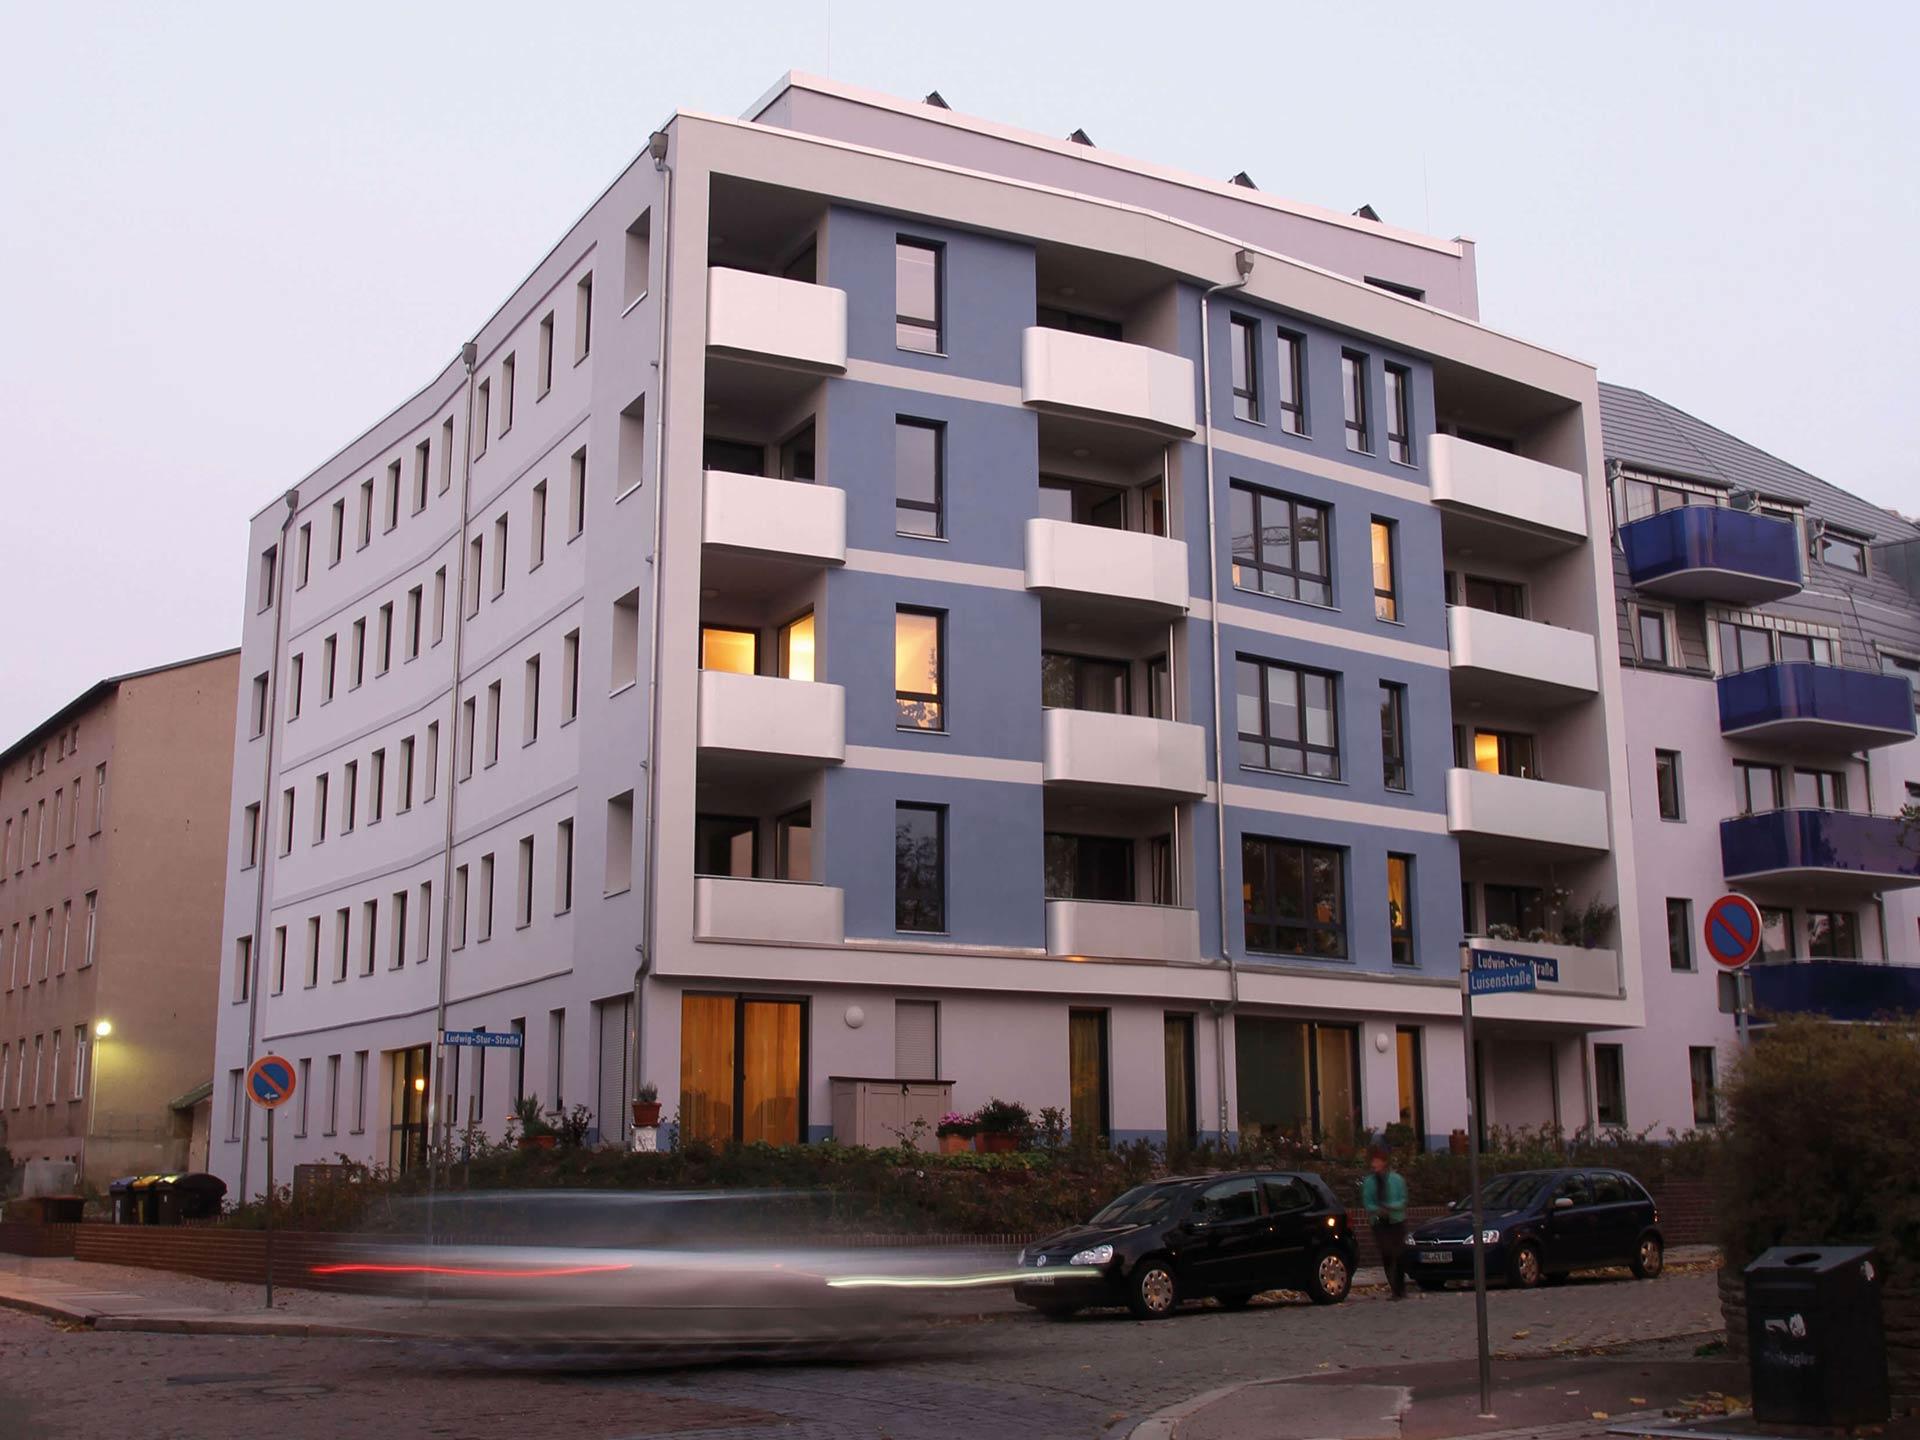 Neubau Haus Luisenstrasse 1